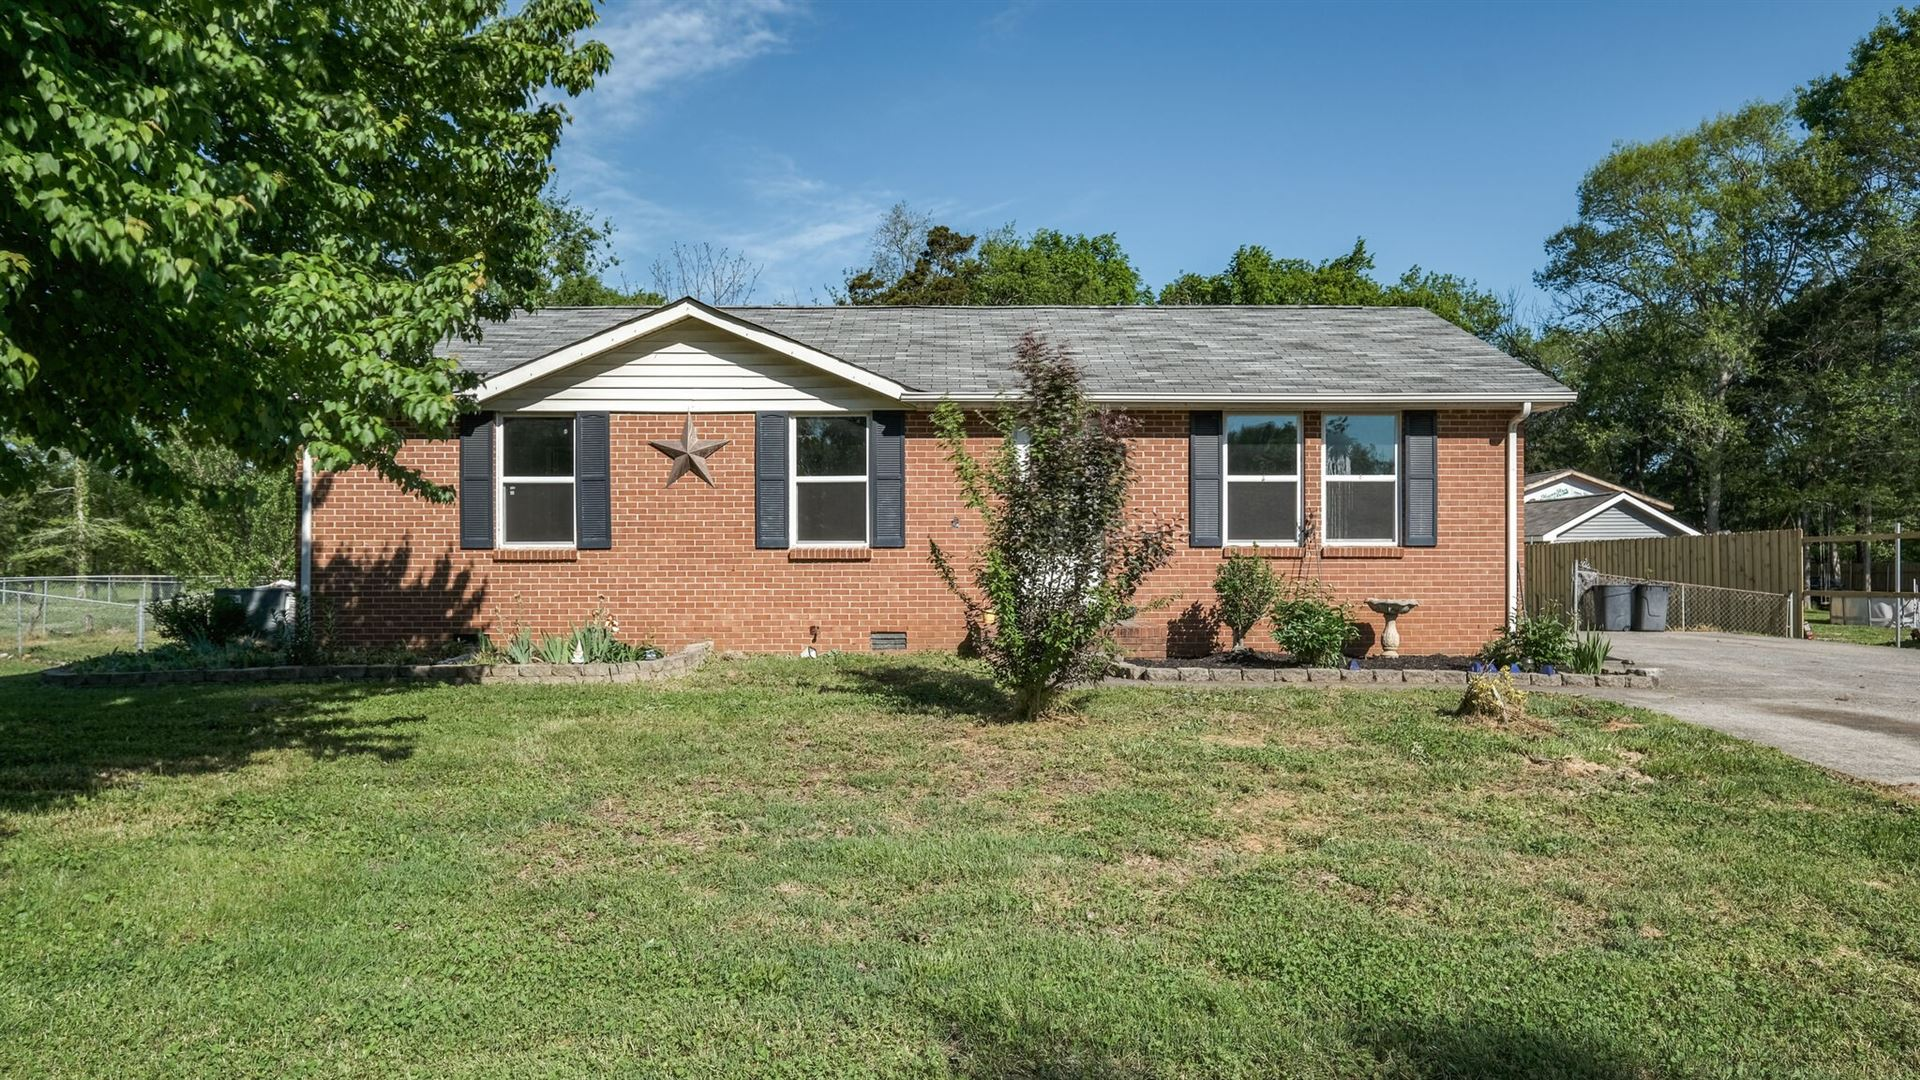 6227 Sedgeridge Ave, Murfreesboro, TN 37129 - MLS#: 2250258